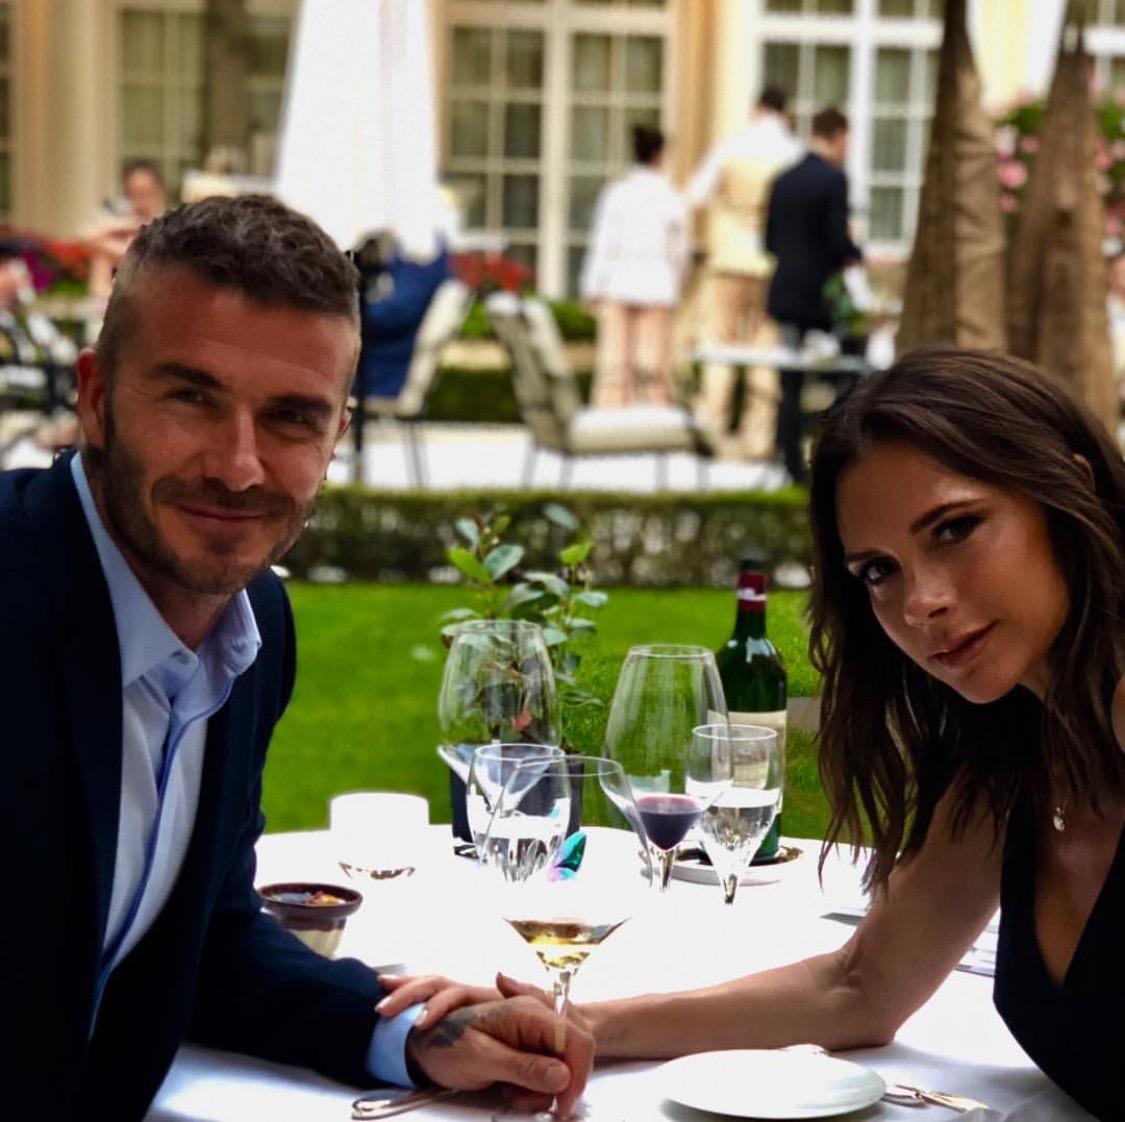 It's David and Victoria's 19th wedding anniversary